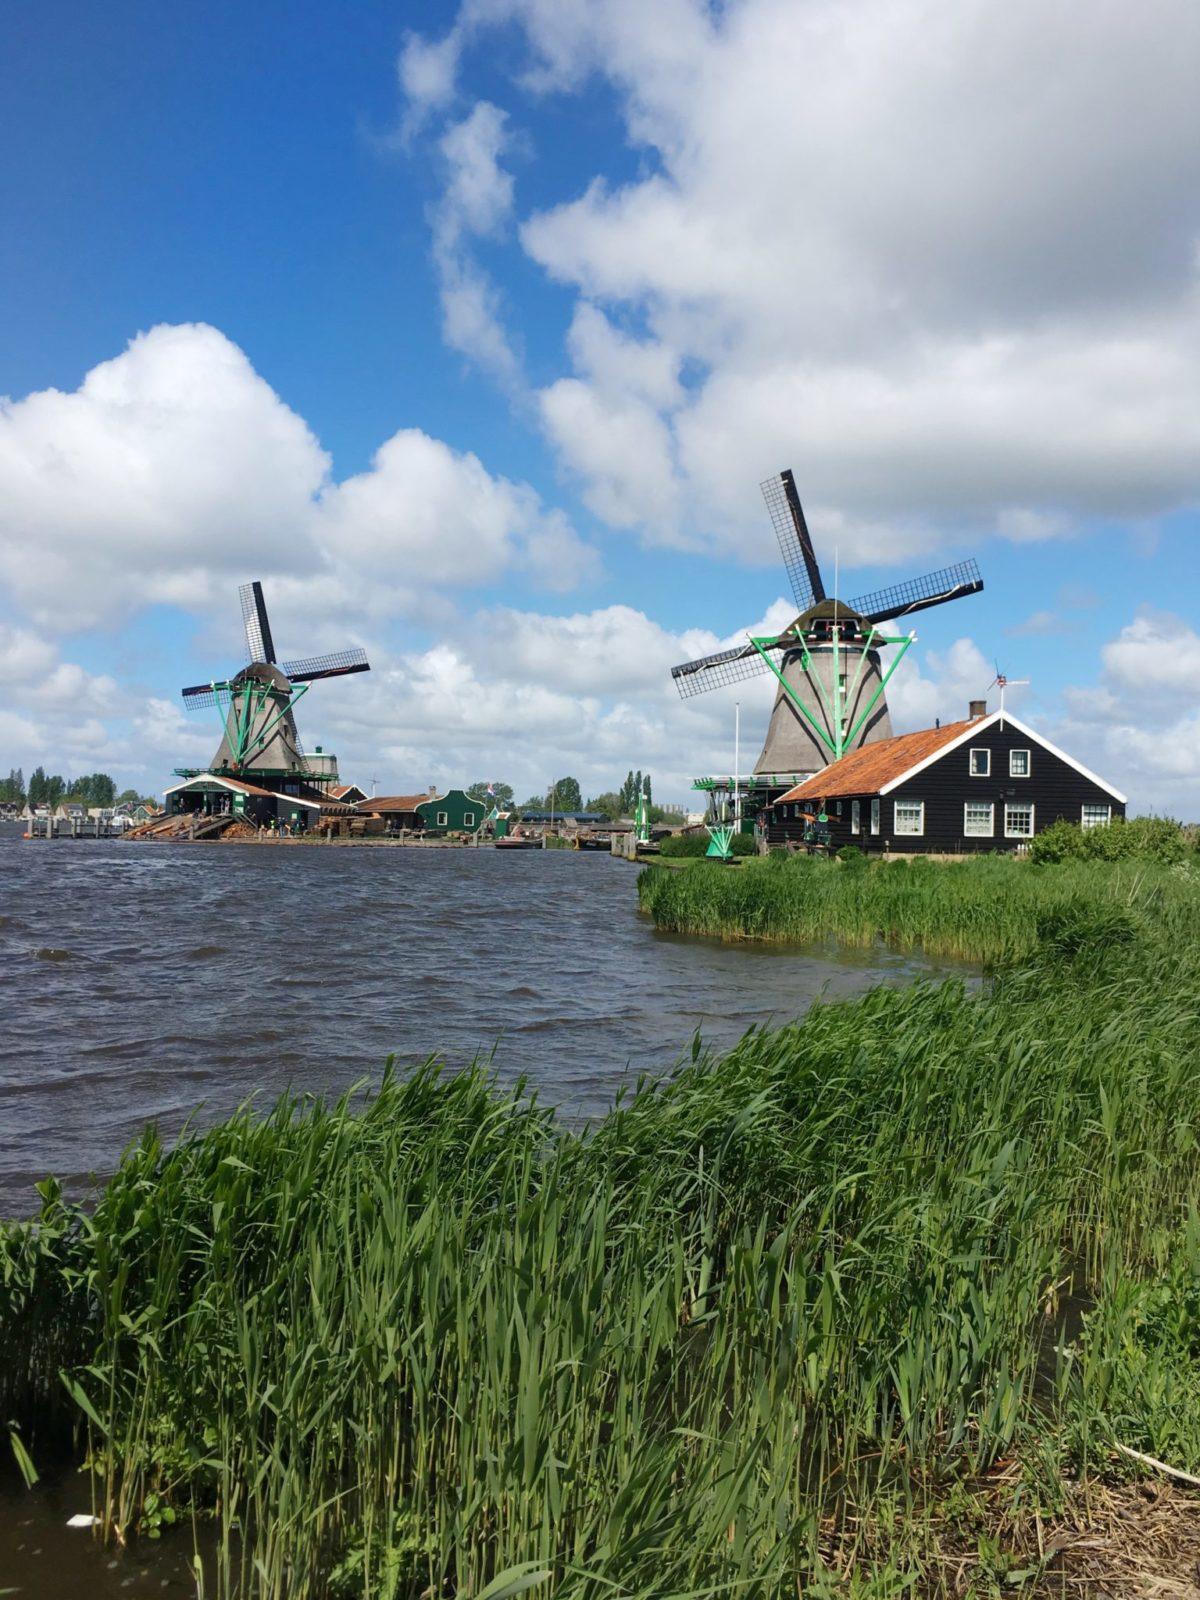 Музей под открытым небом Zaanse Schans, Нидерланды